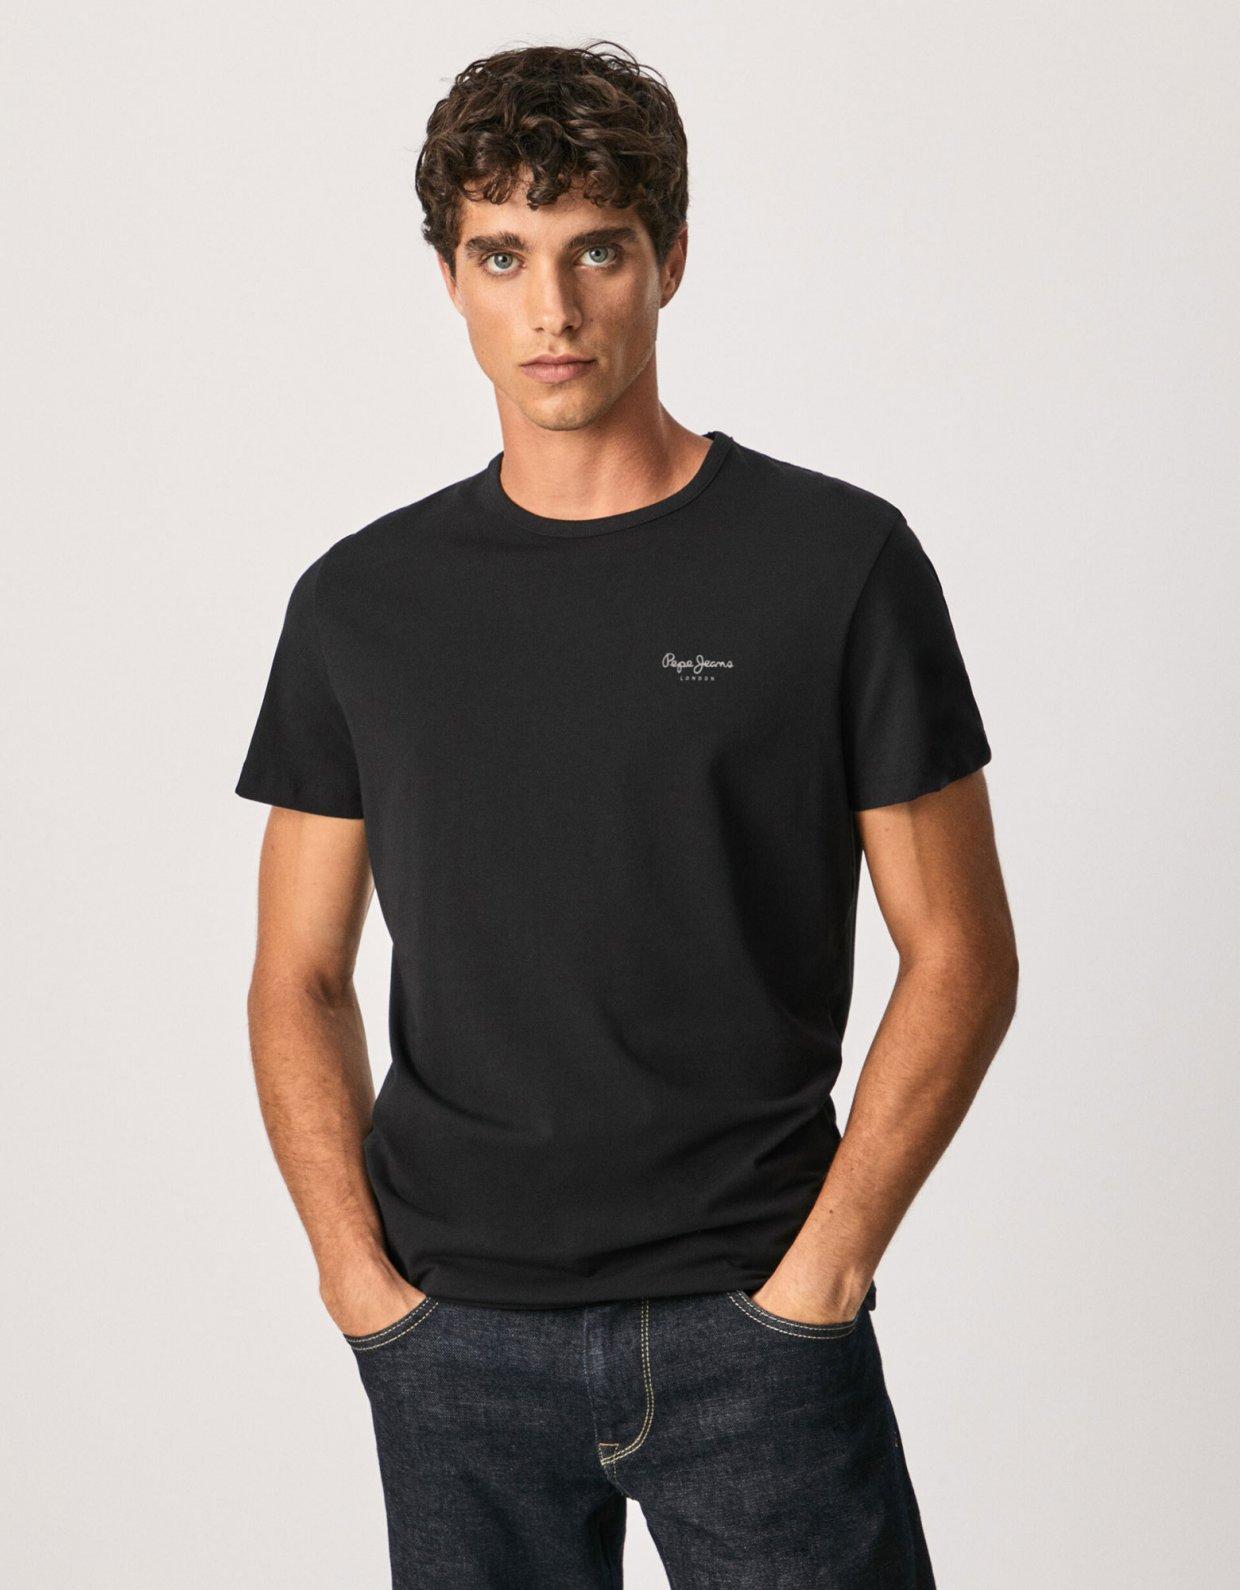 Pepe Jeans Original basic S/S t-shirt black